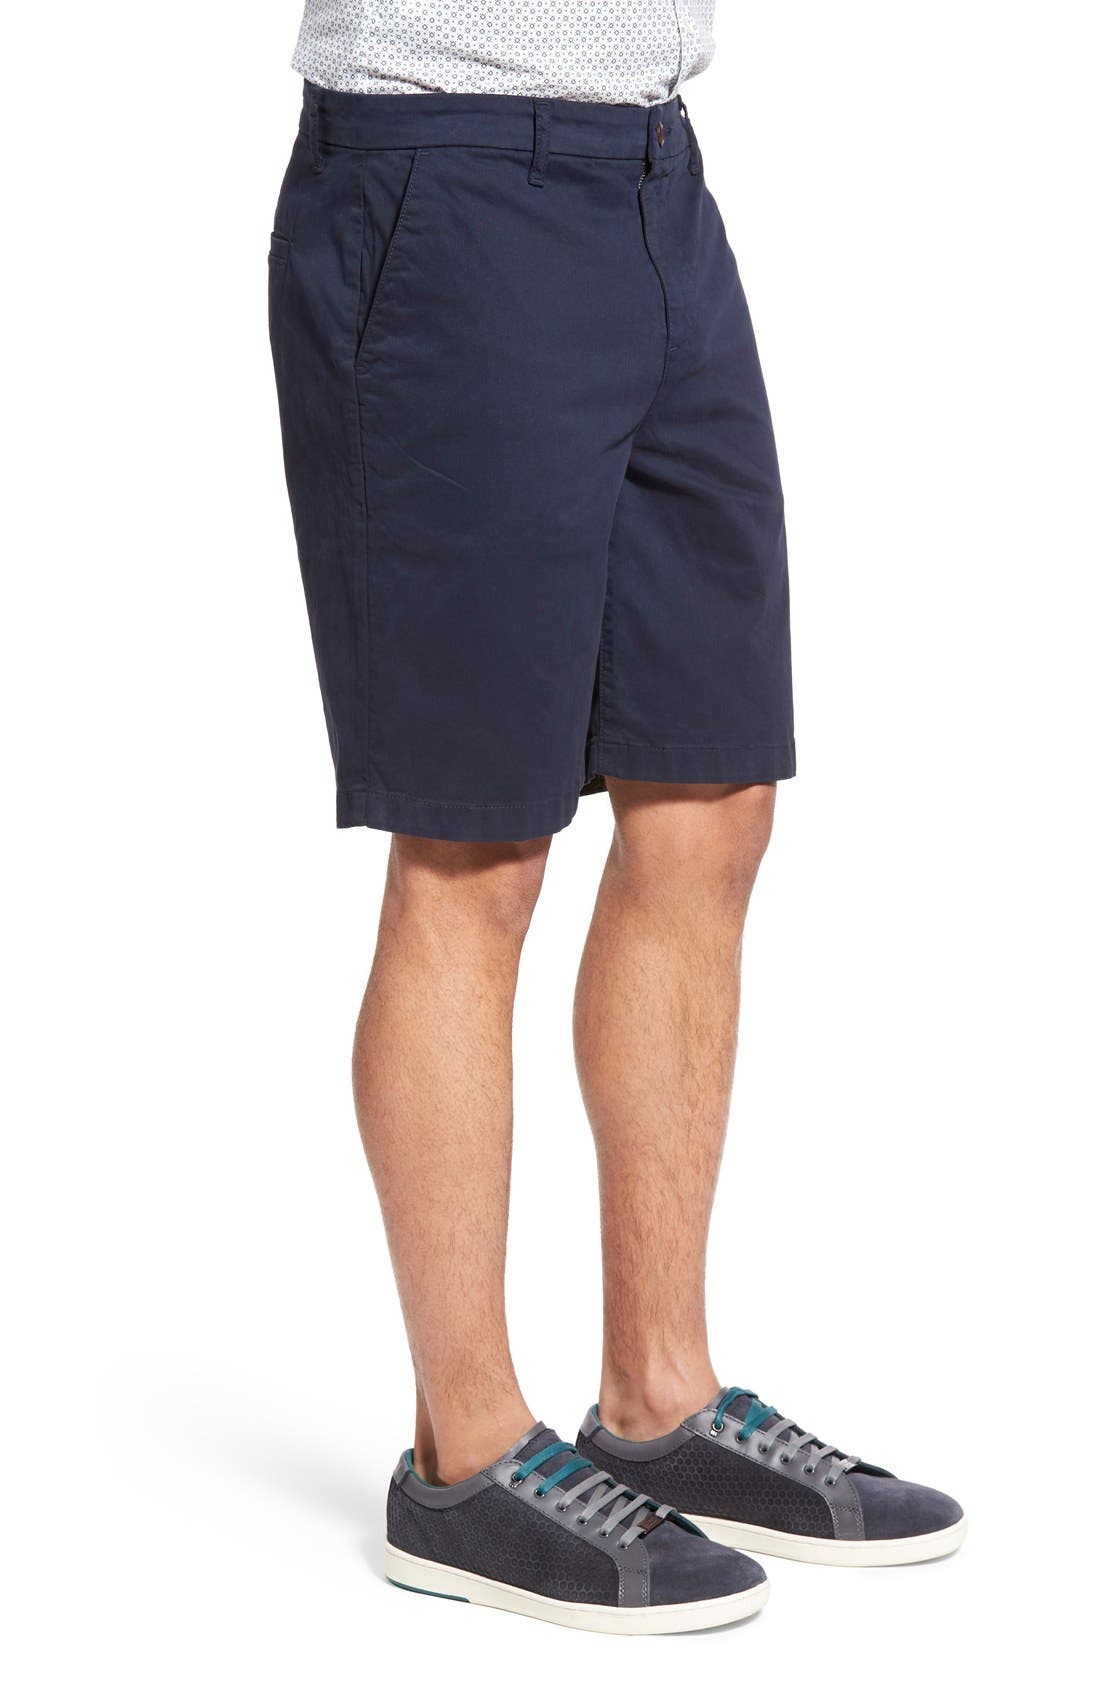 'Thompson' Slim Fit Shorts,                             Alternate thumbnail 3, color,                             Navy Cadet